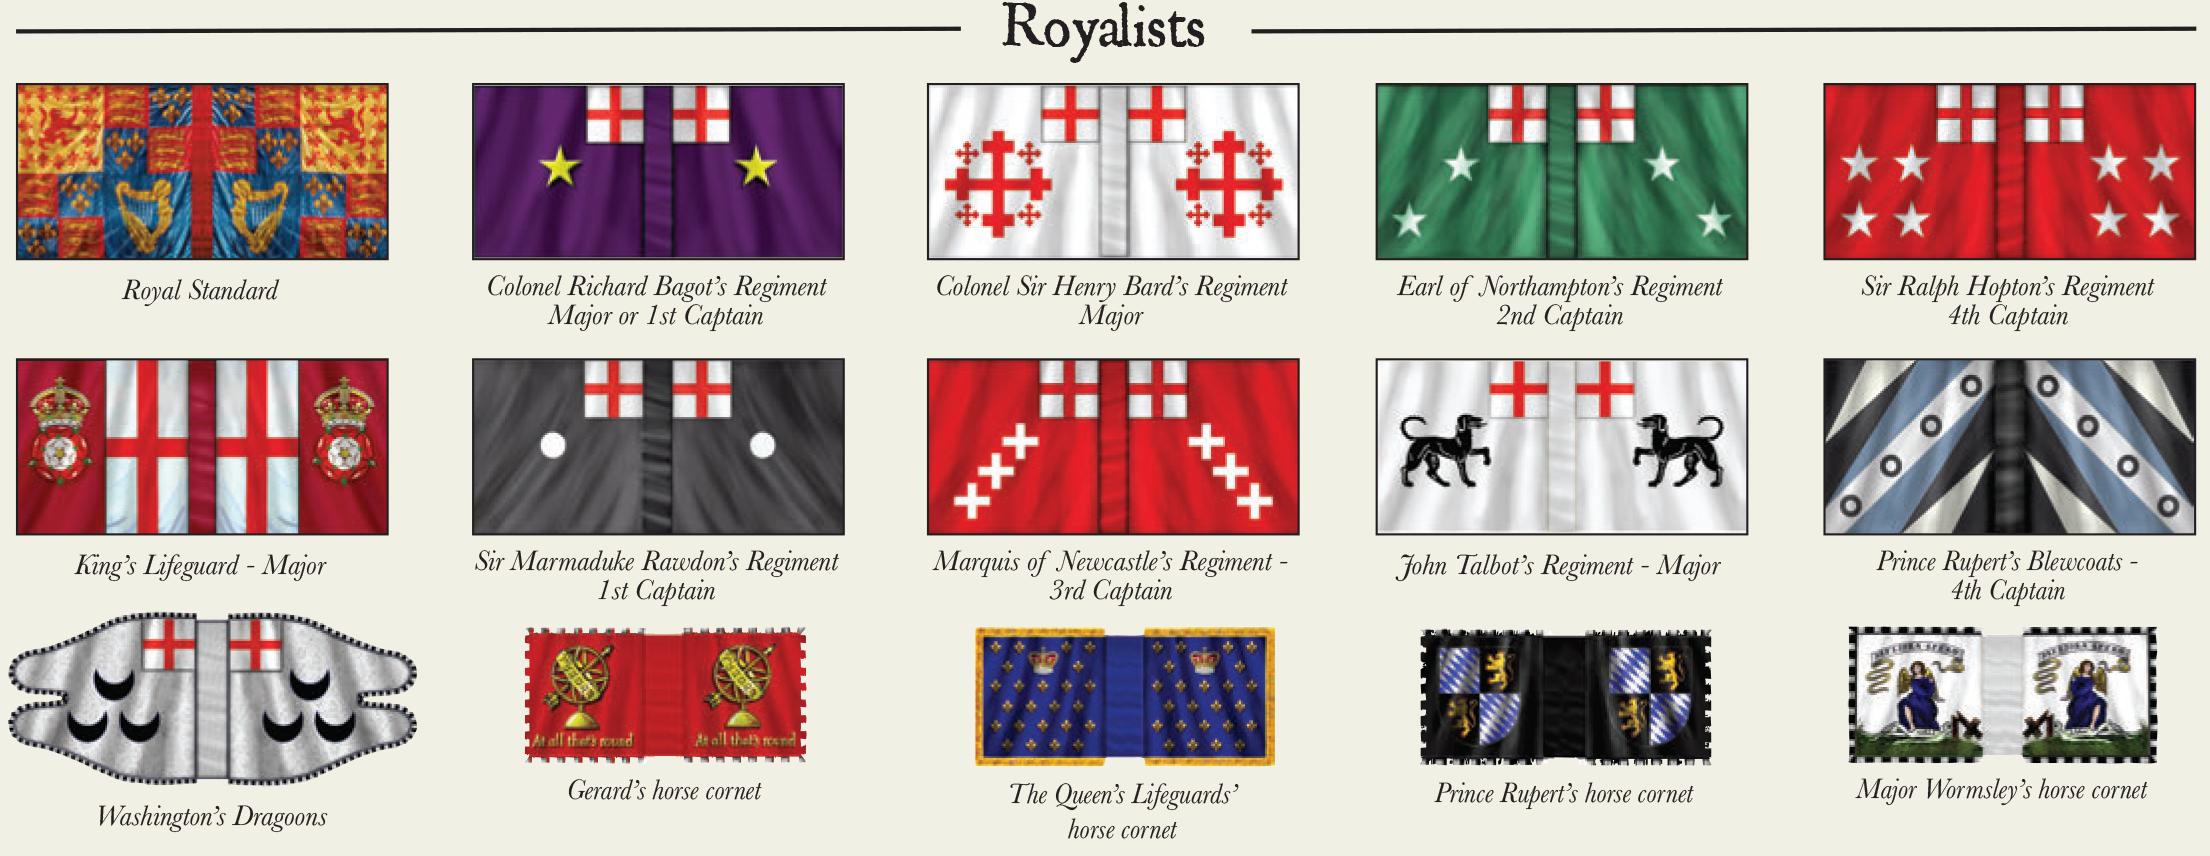 Royalist Flag Colours